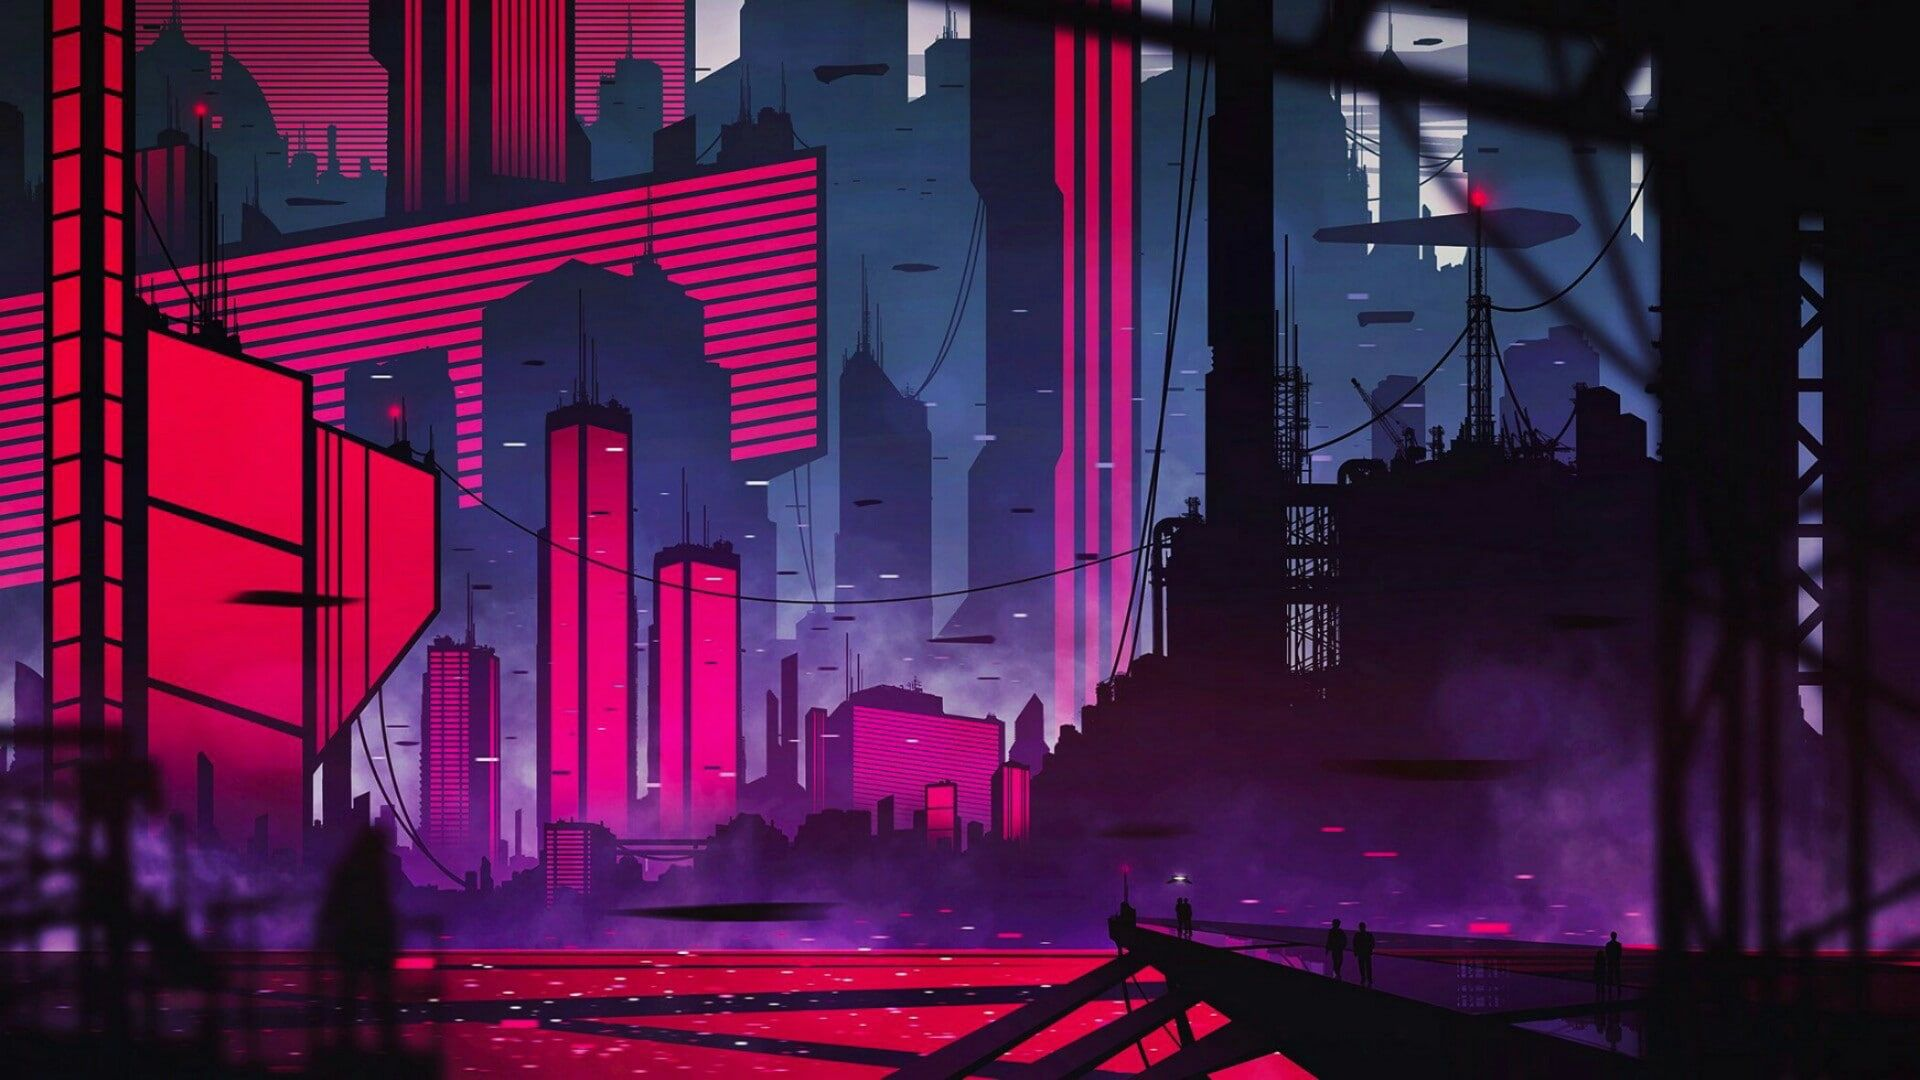 Future Neon City Skycraper Stage Metropolis Darkness Scene Night 1080p Wallpaper Hdwallpaper D In 2020 City Wallpaper Building Illustration Neon Aesthetic